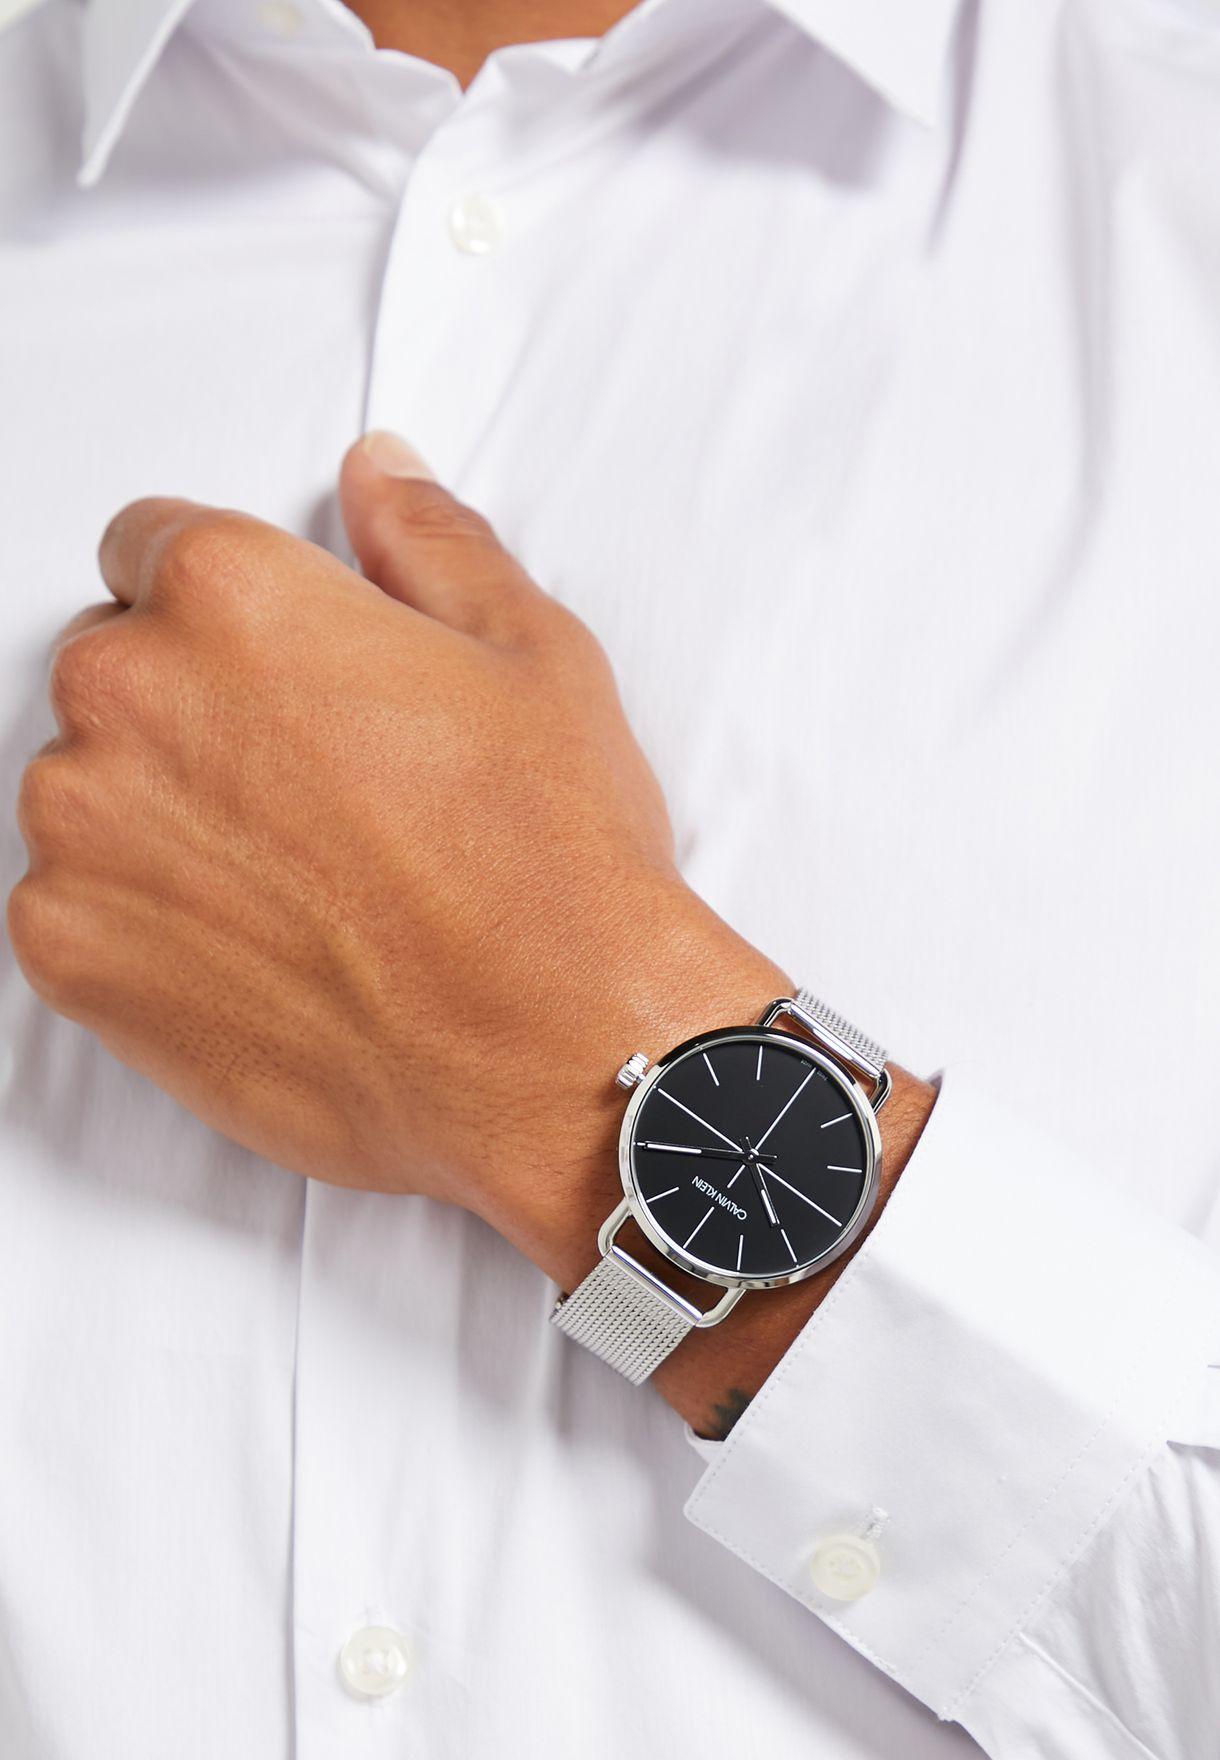 K7B211-21 Analog Watch